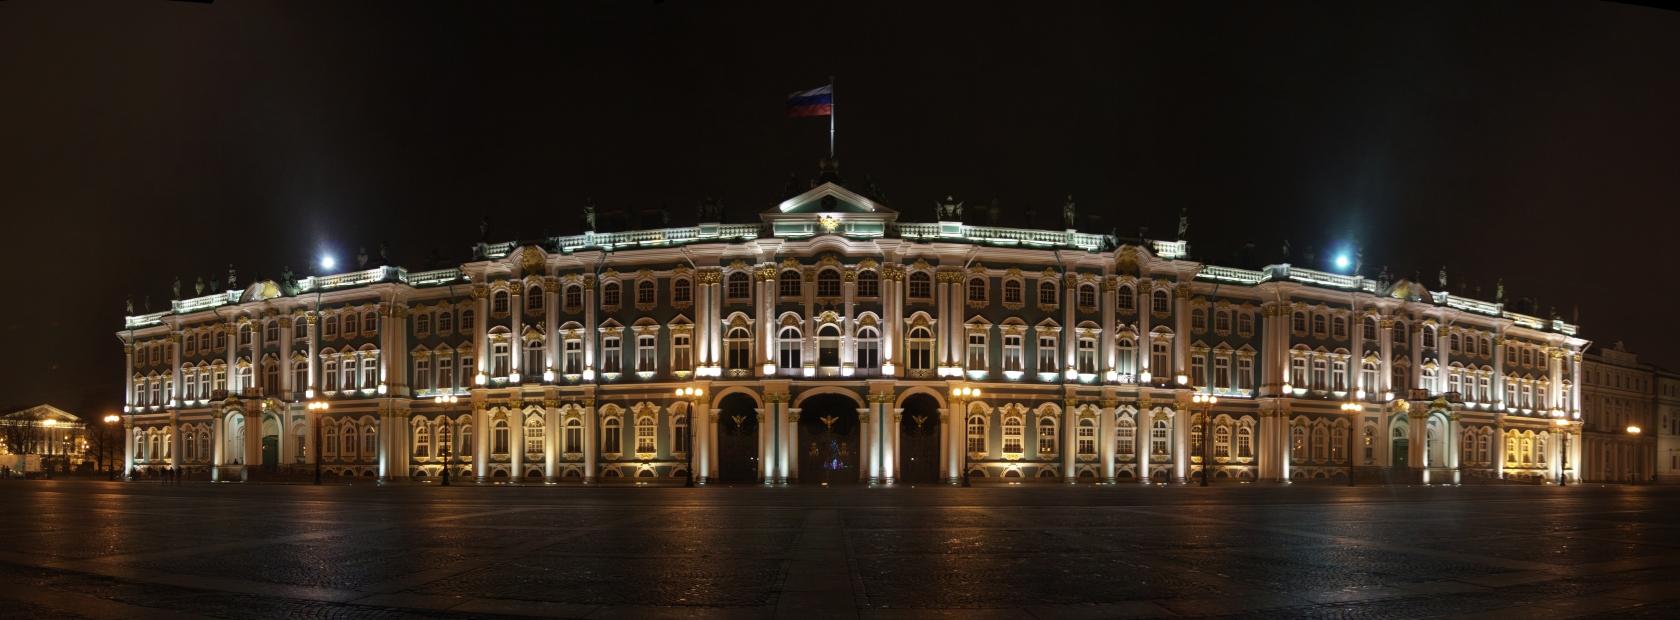 State Hermitage Museum in St. Petersburg at night